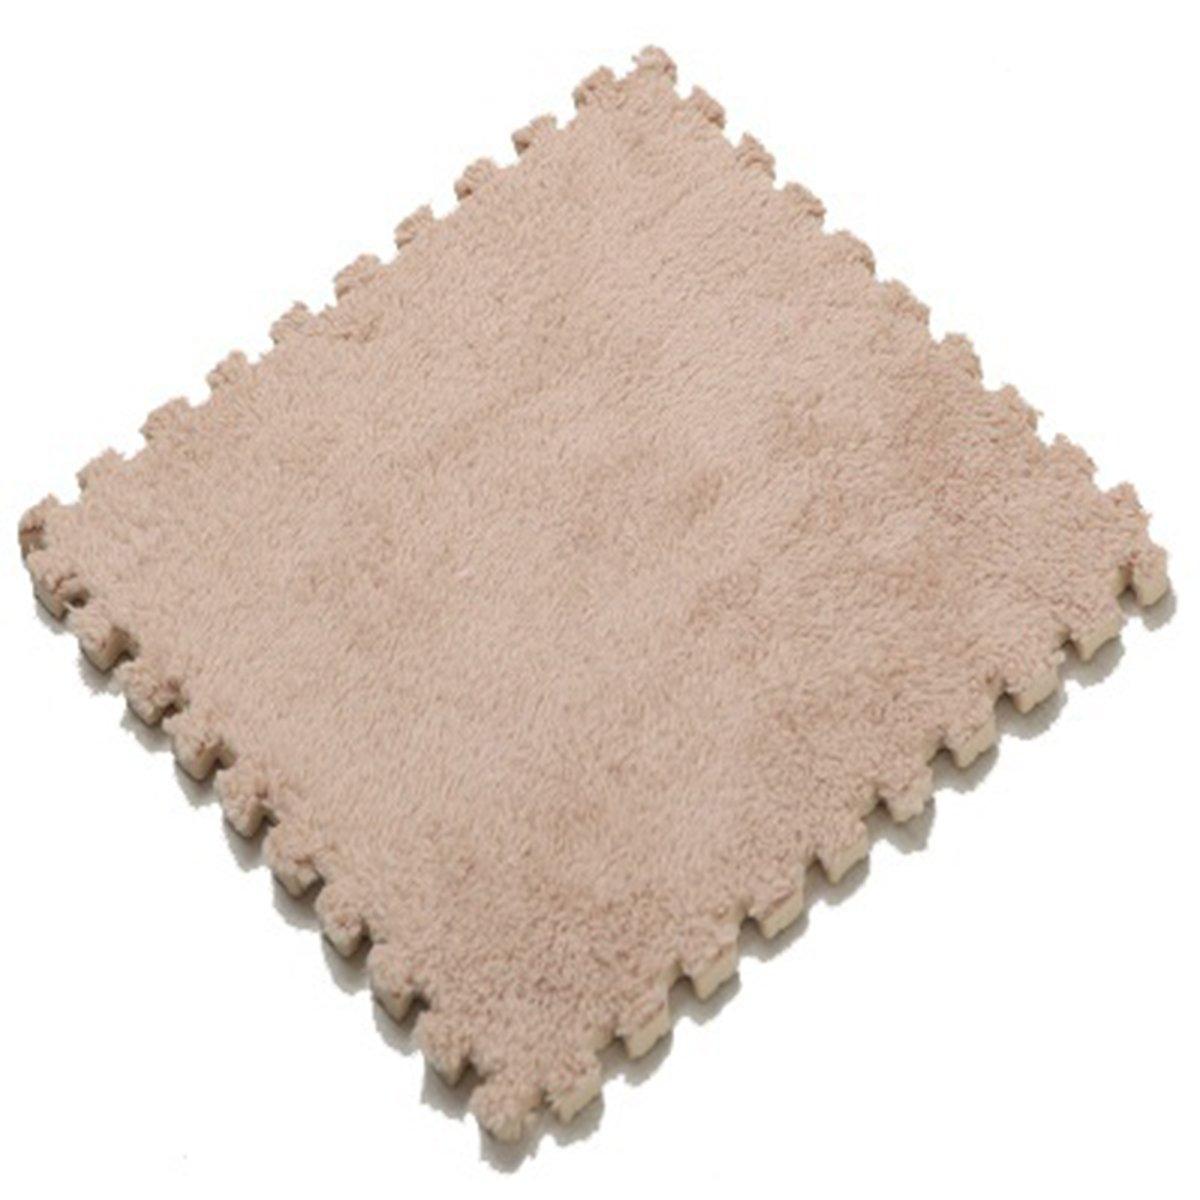 Furry Plush Eva Foam Anti-Slip & Durable Carpet Rug Soft Cushion Mats - Set of 9 Tiles(12x12 inches)-Ideal Nursery Decor,Playroom & Kids Baby Room (Beige) QIZHENG